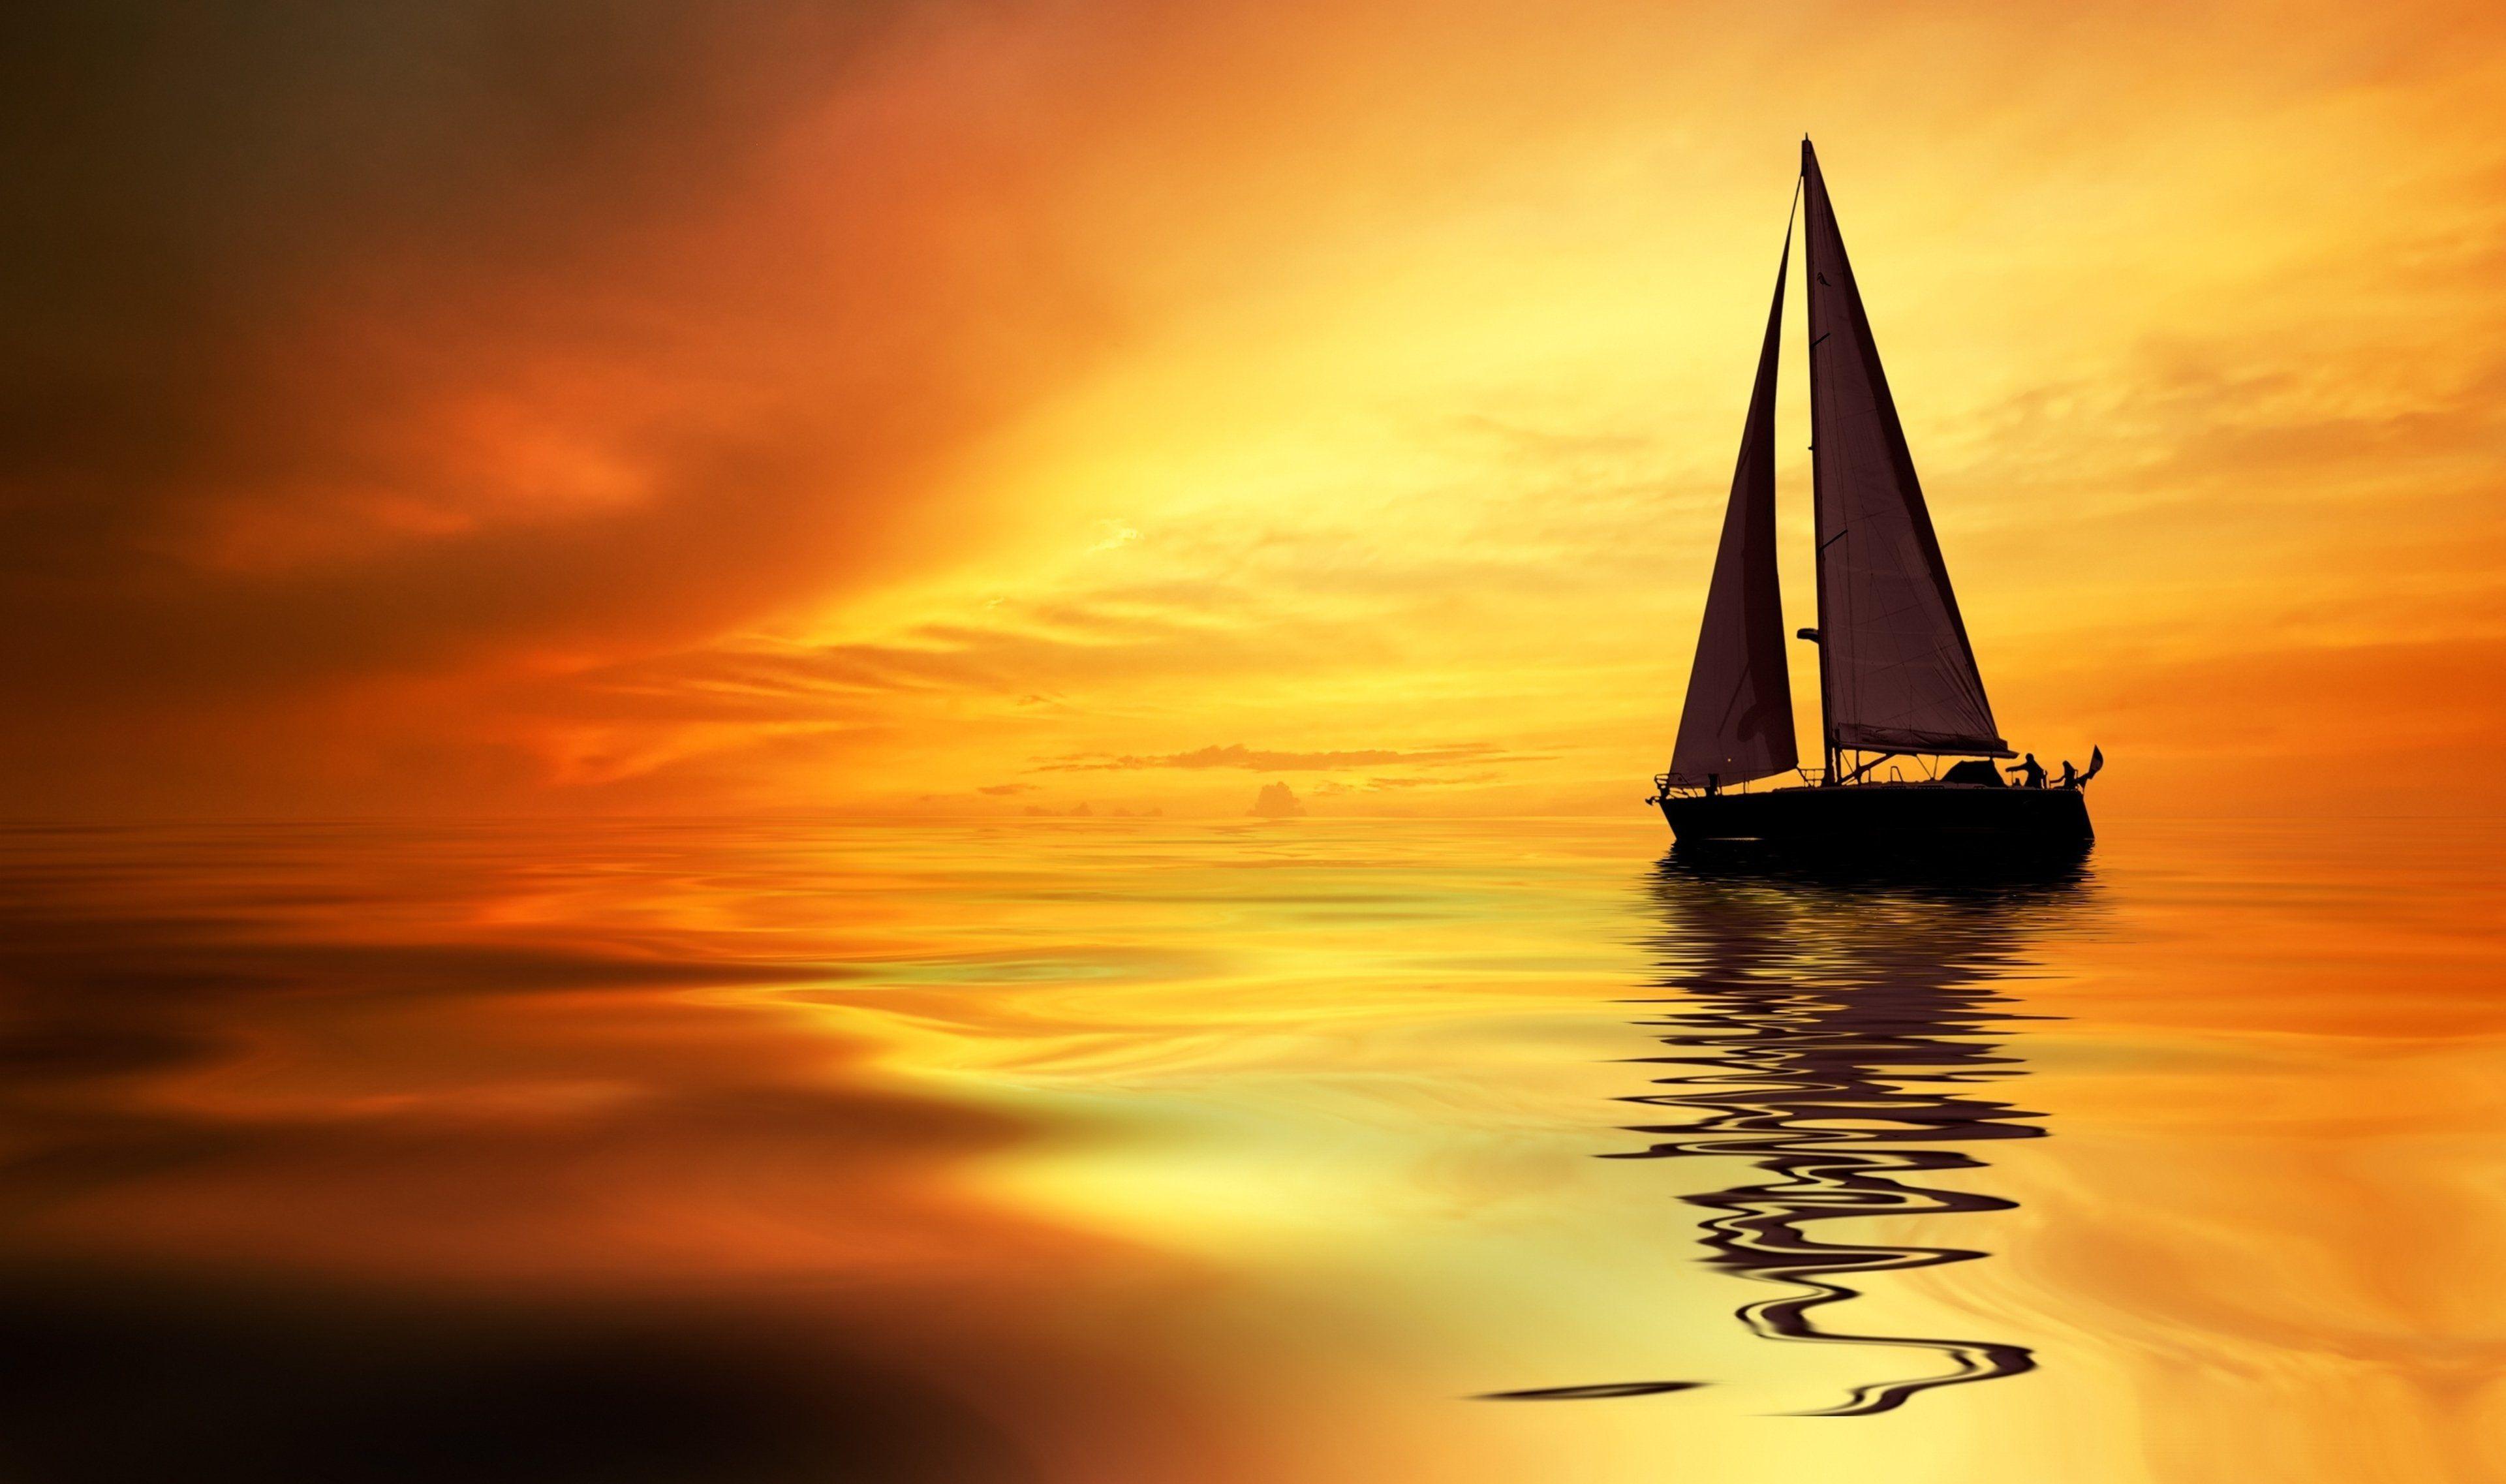 sea ocean boat yacht sky clouds sunset orange landscapes